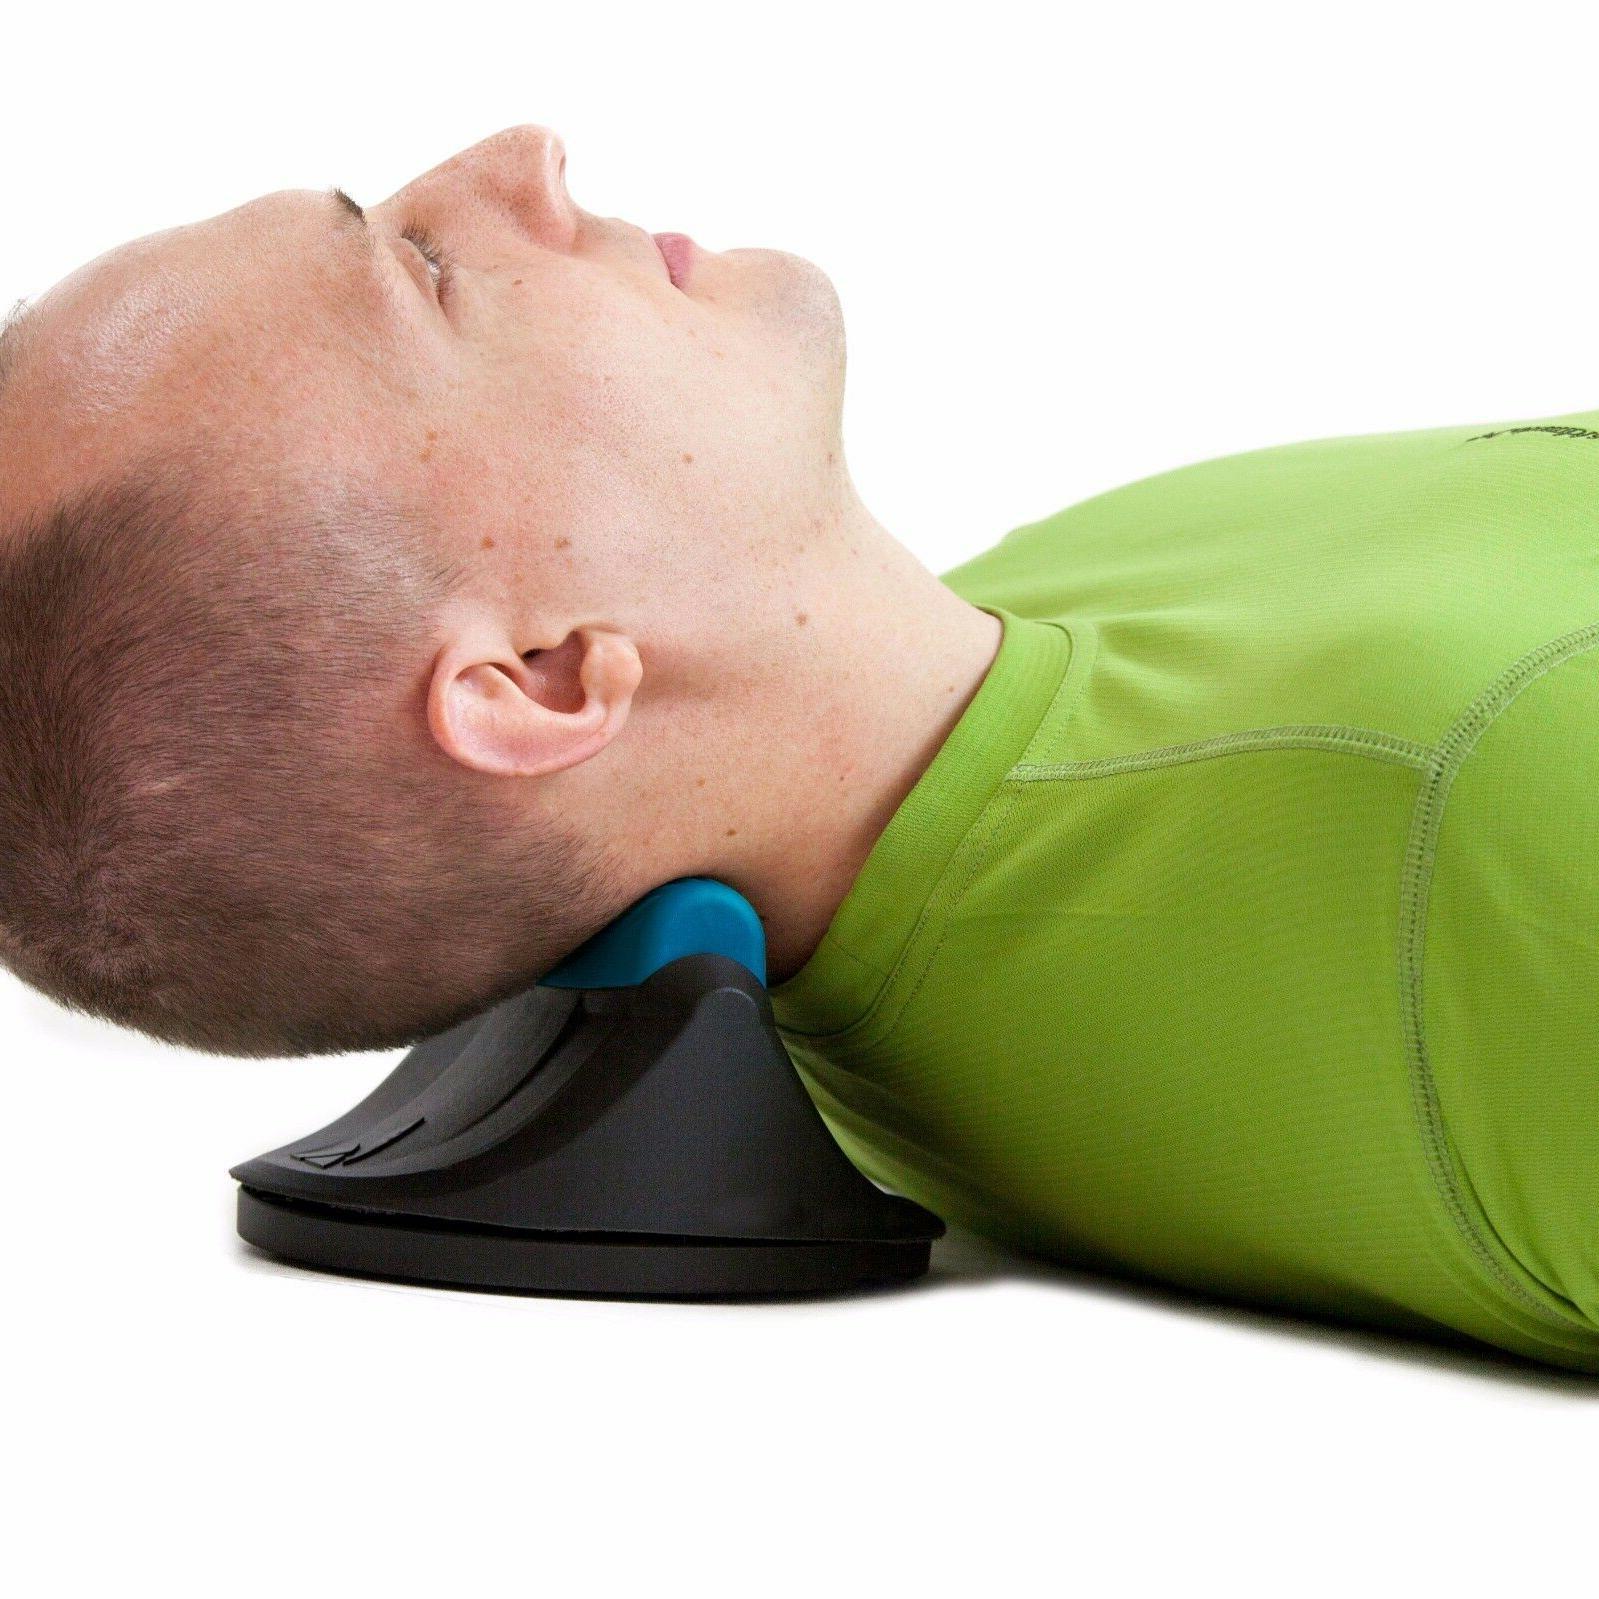 Teeter Neck -Decompress to Tension, & Headache Pain